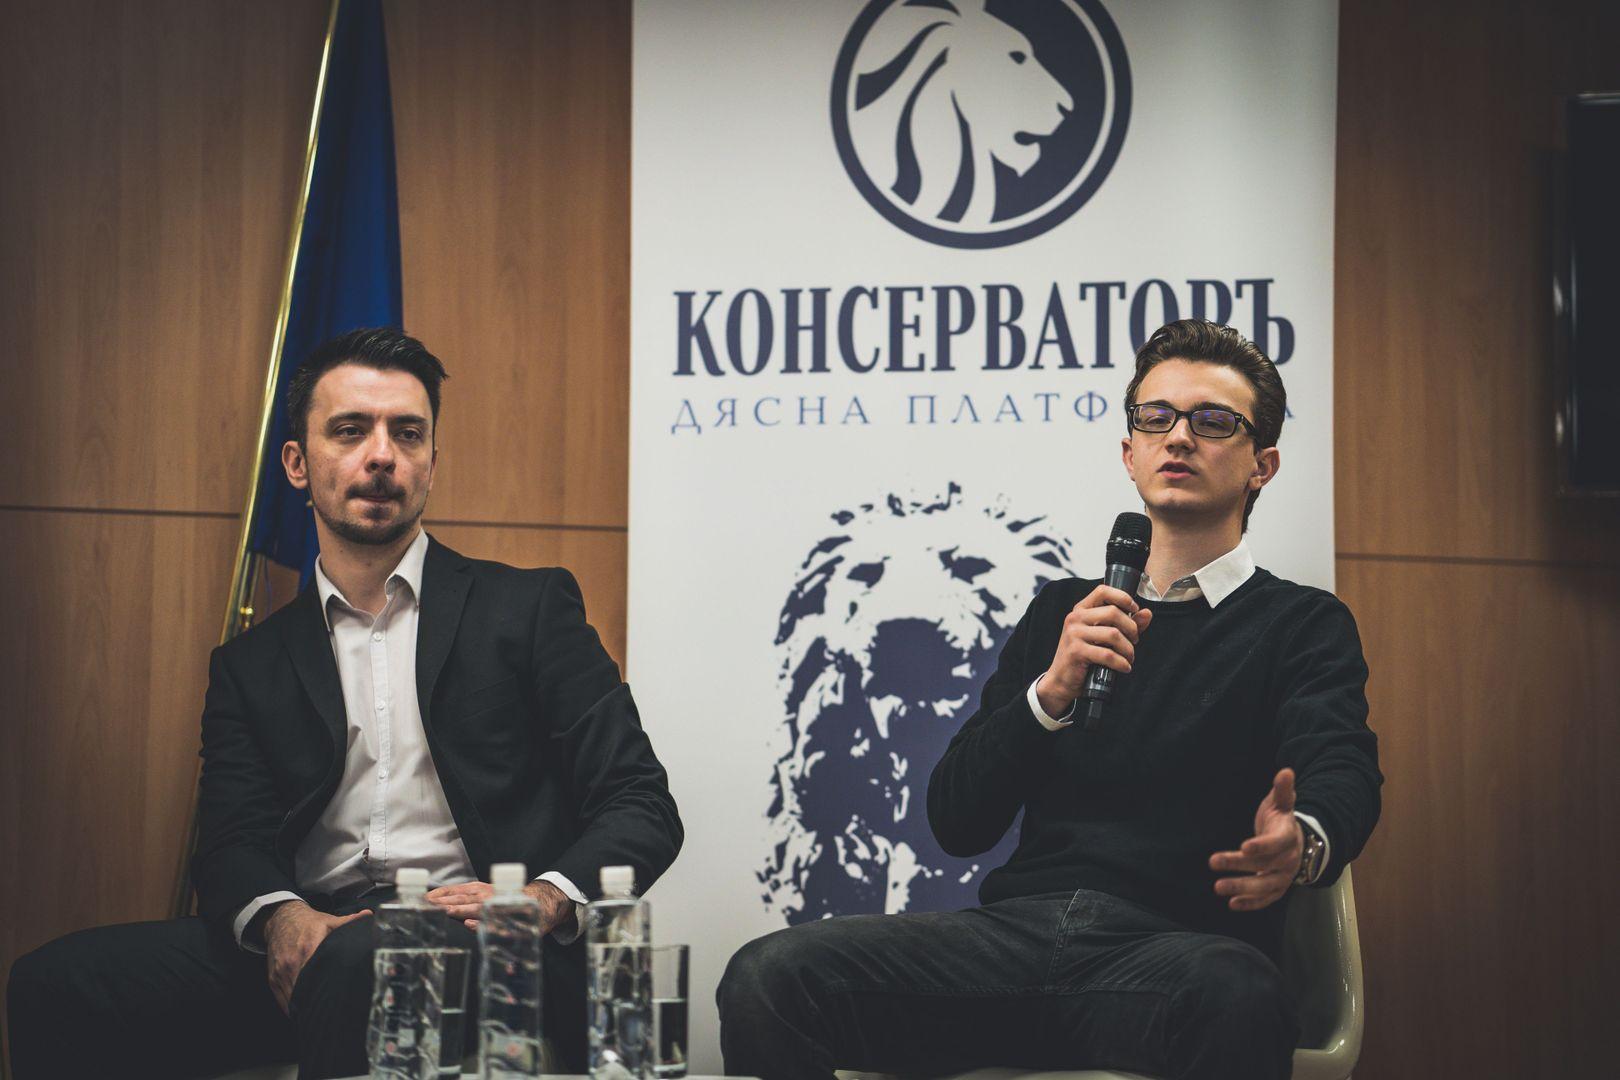 conservative-millenium-strongeurope-event-april-23